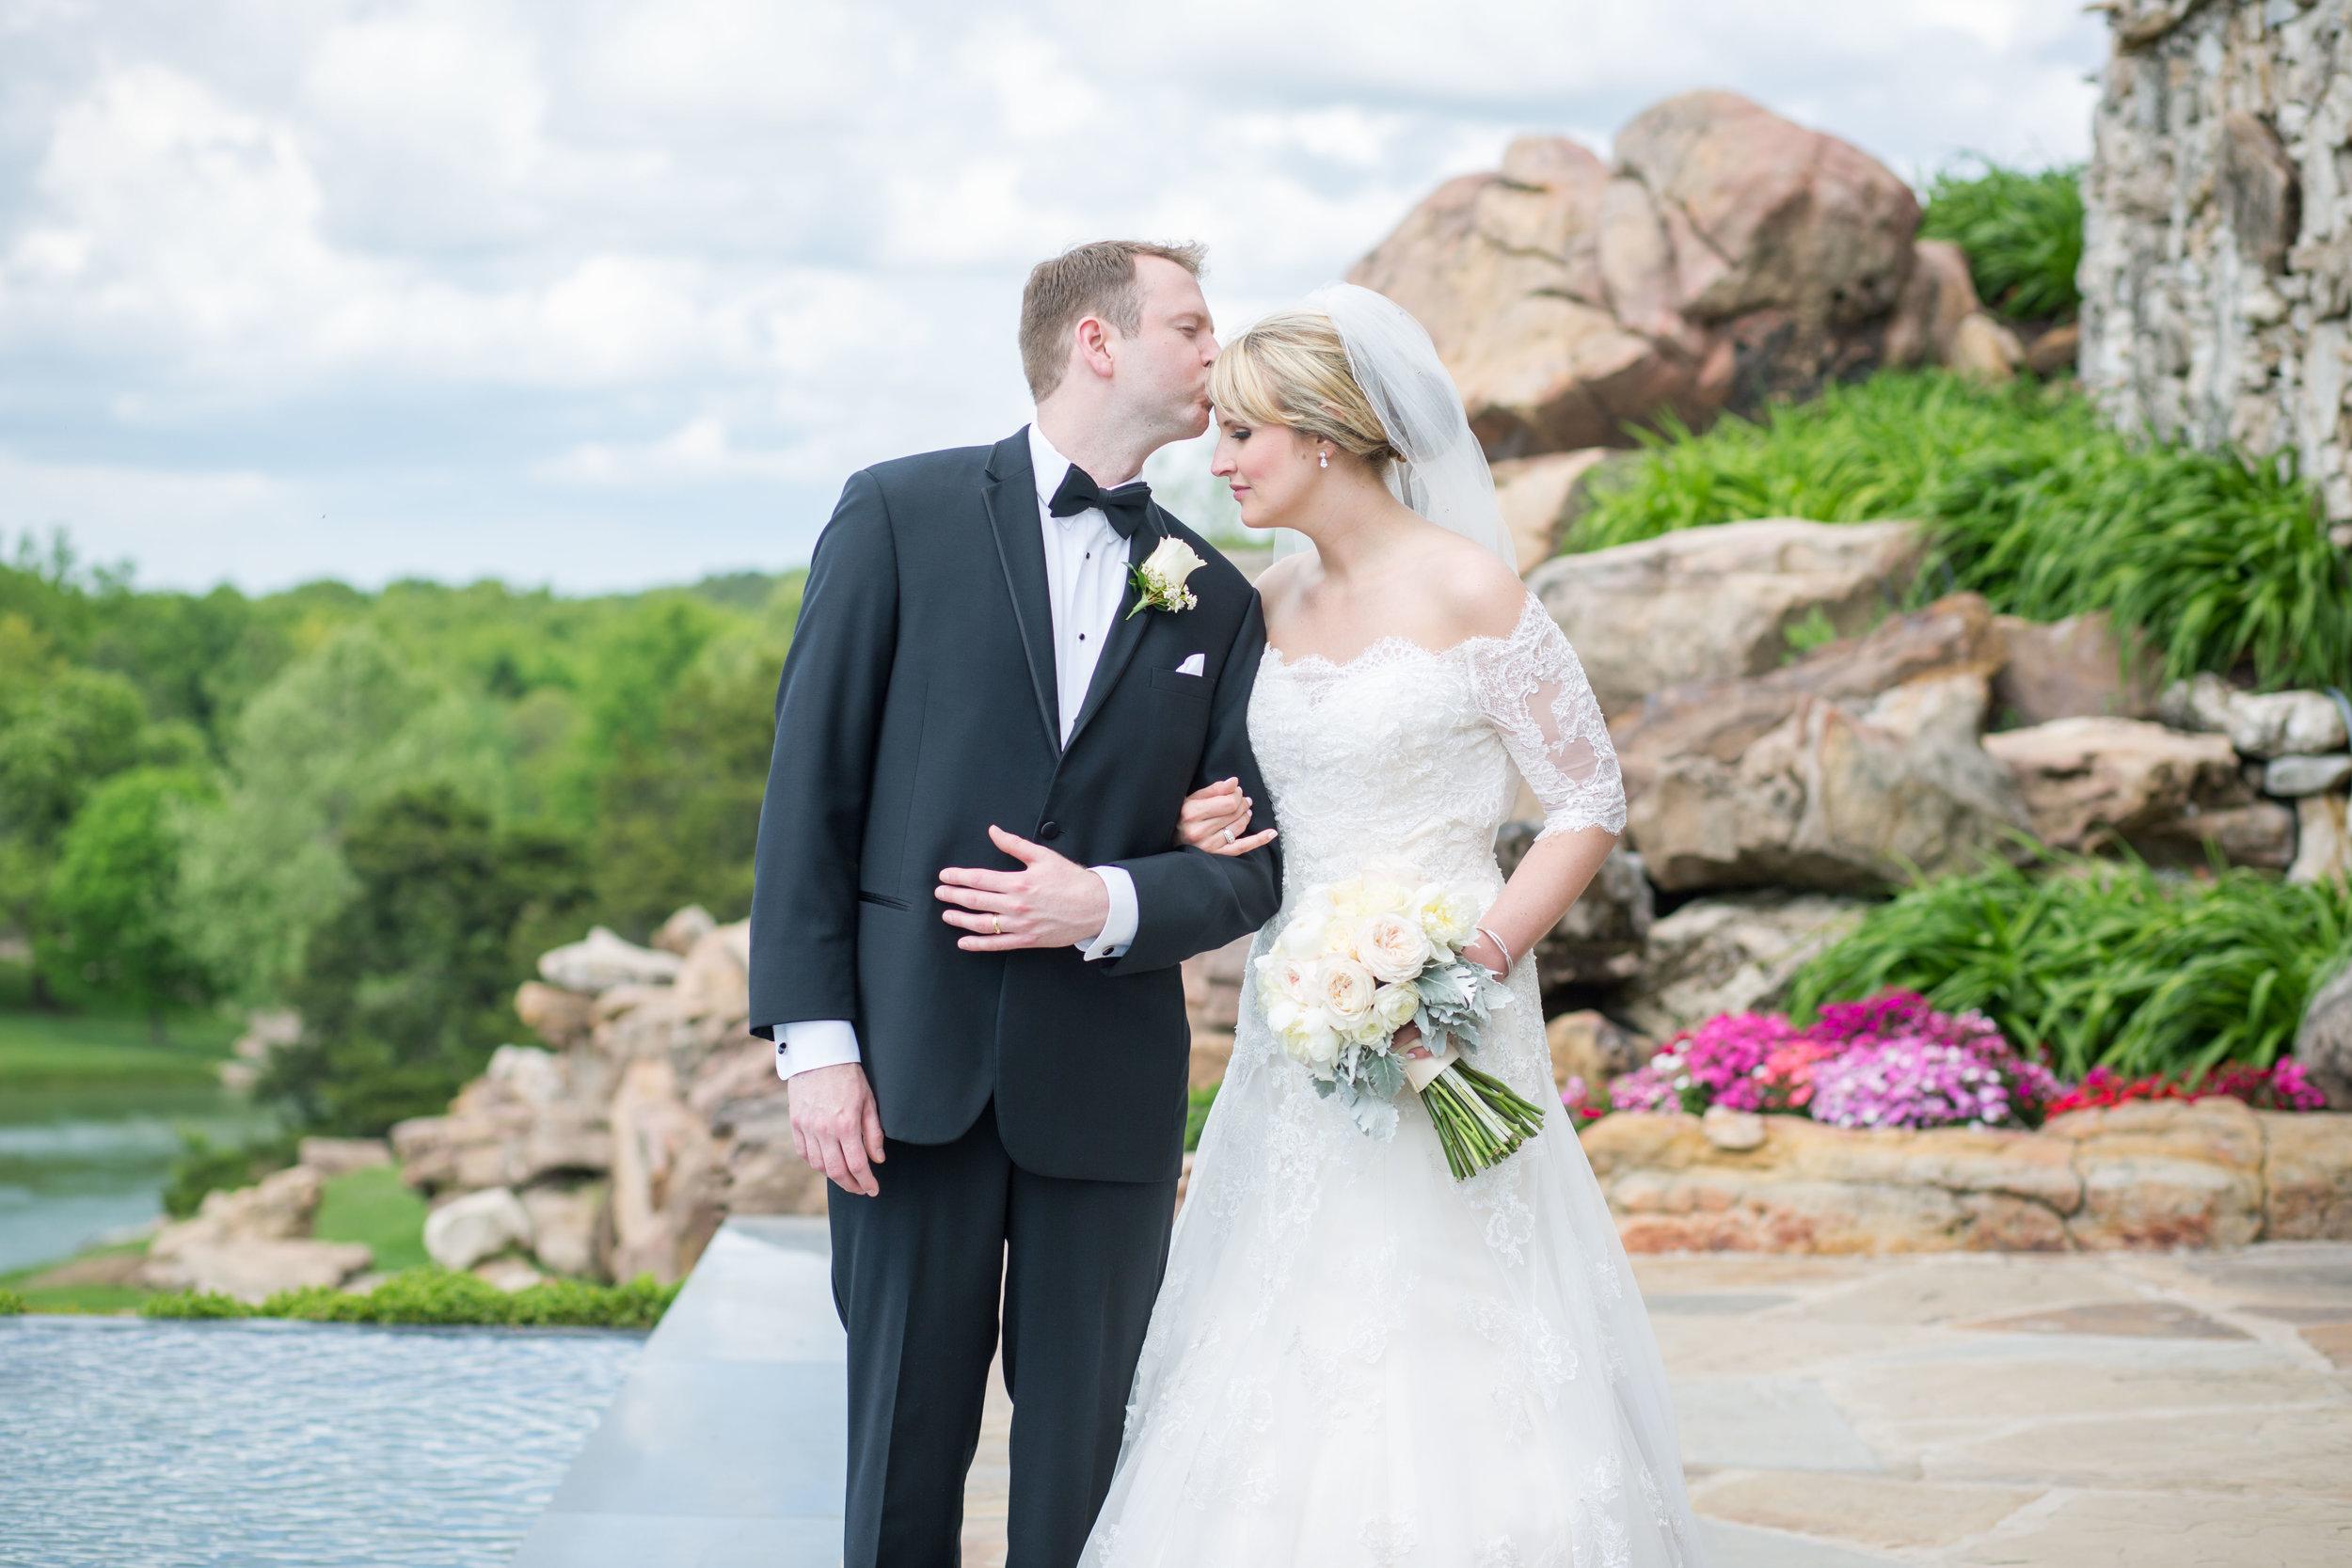 Wedding Photography, Branson Missouri